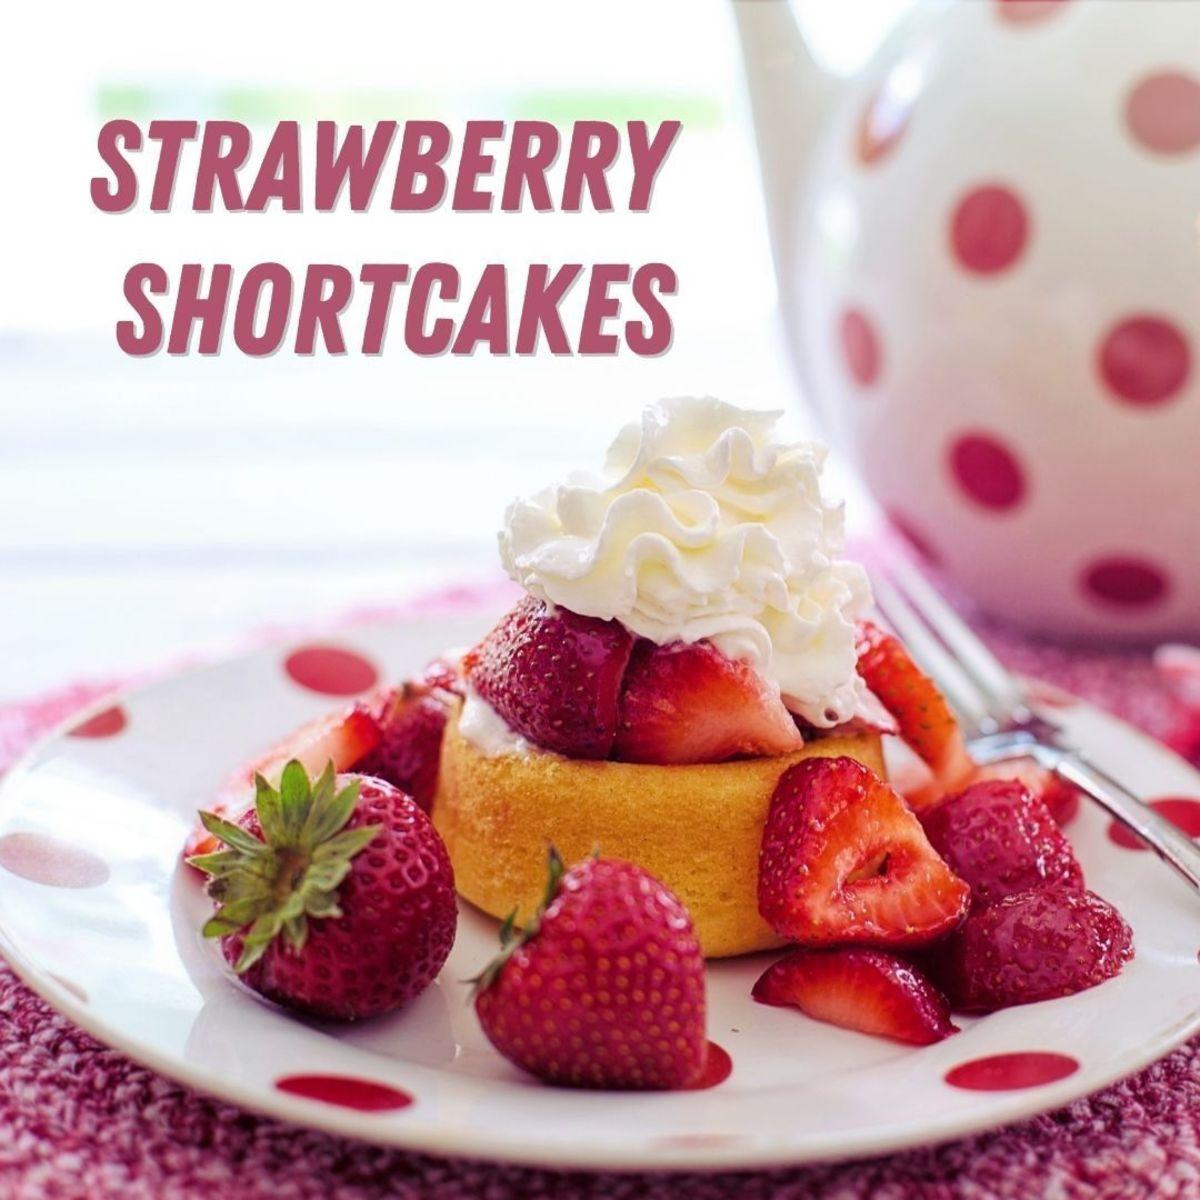 Use a cute group name like Strawberry Shortcakes!